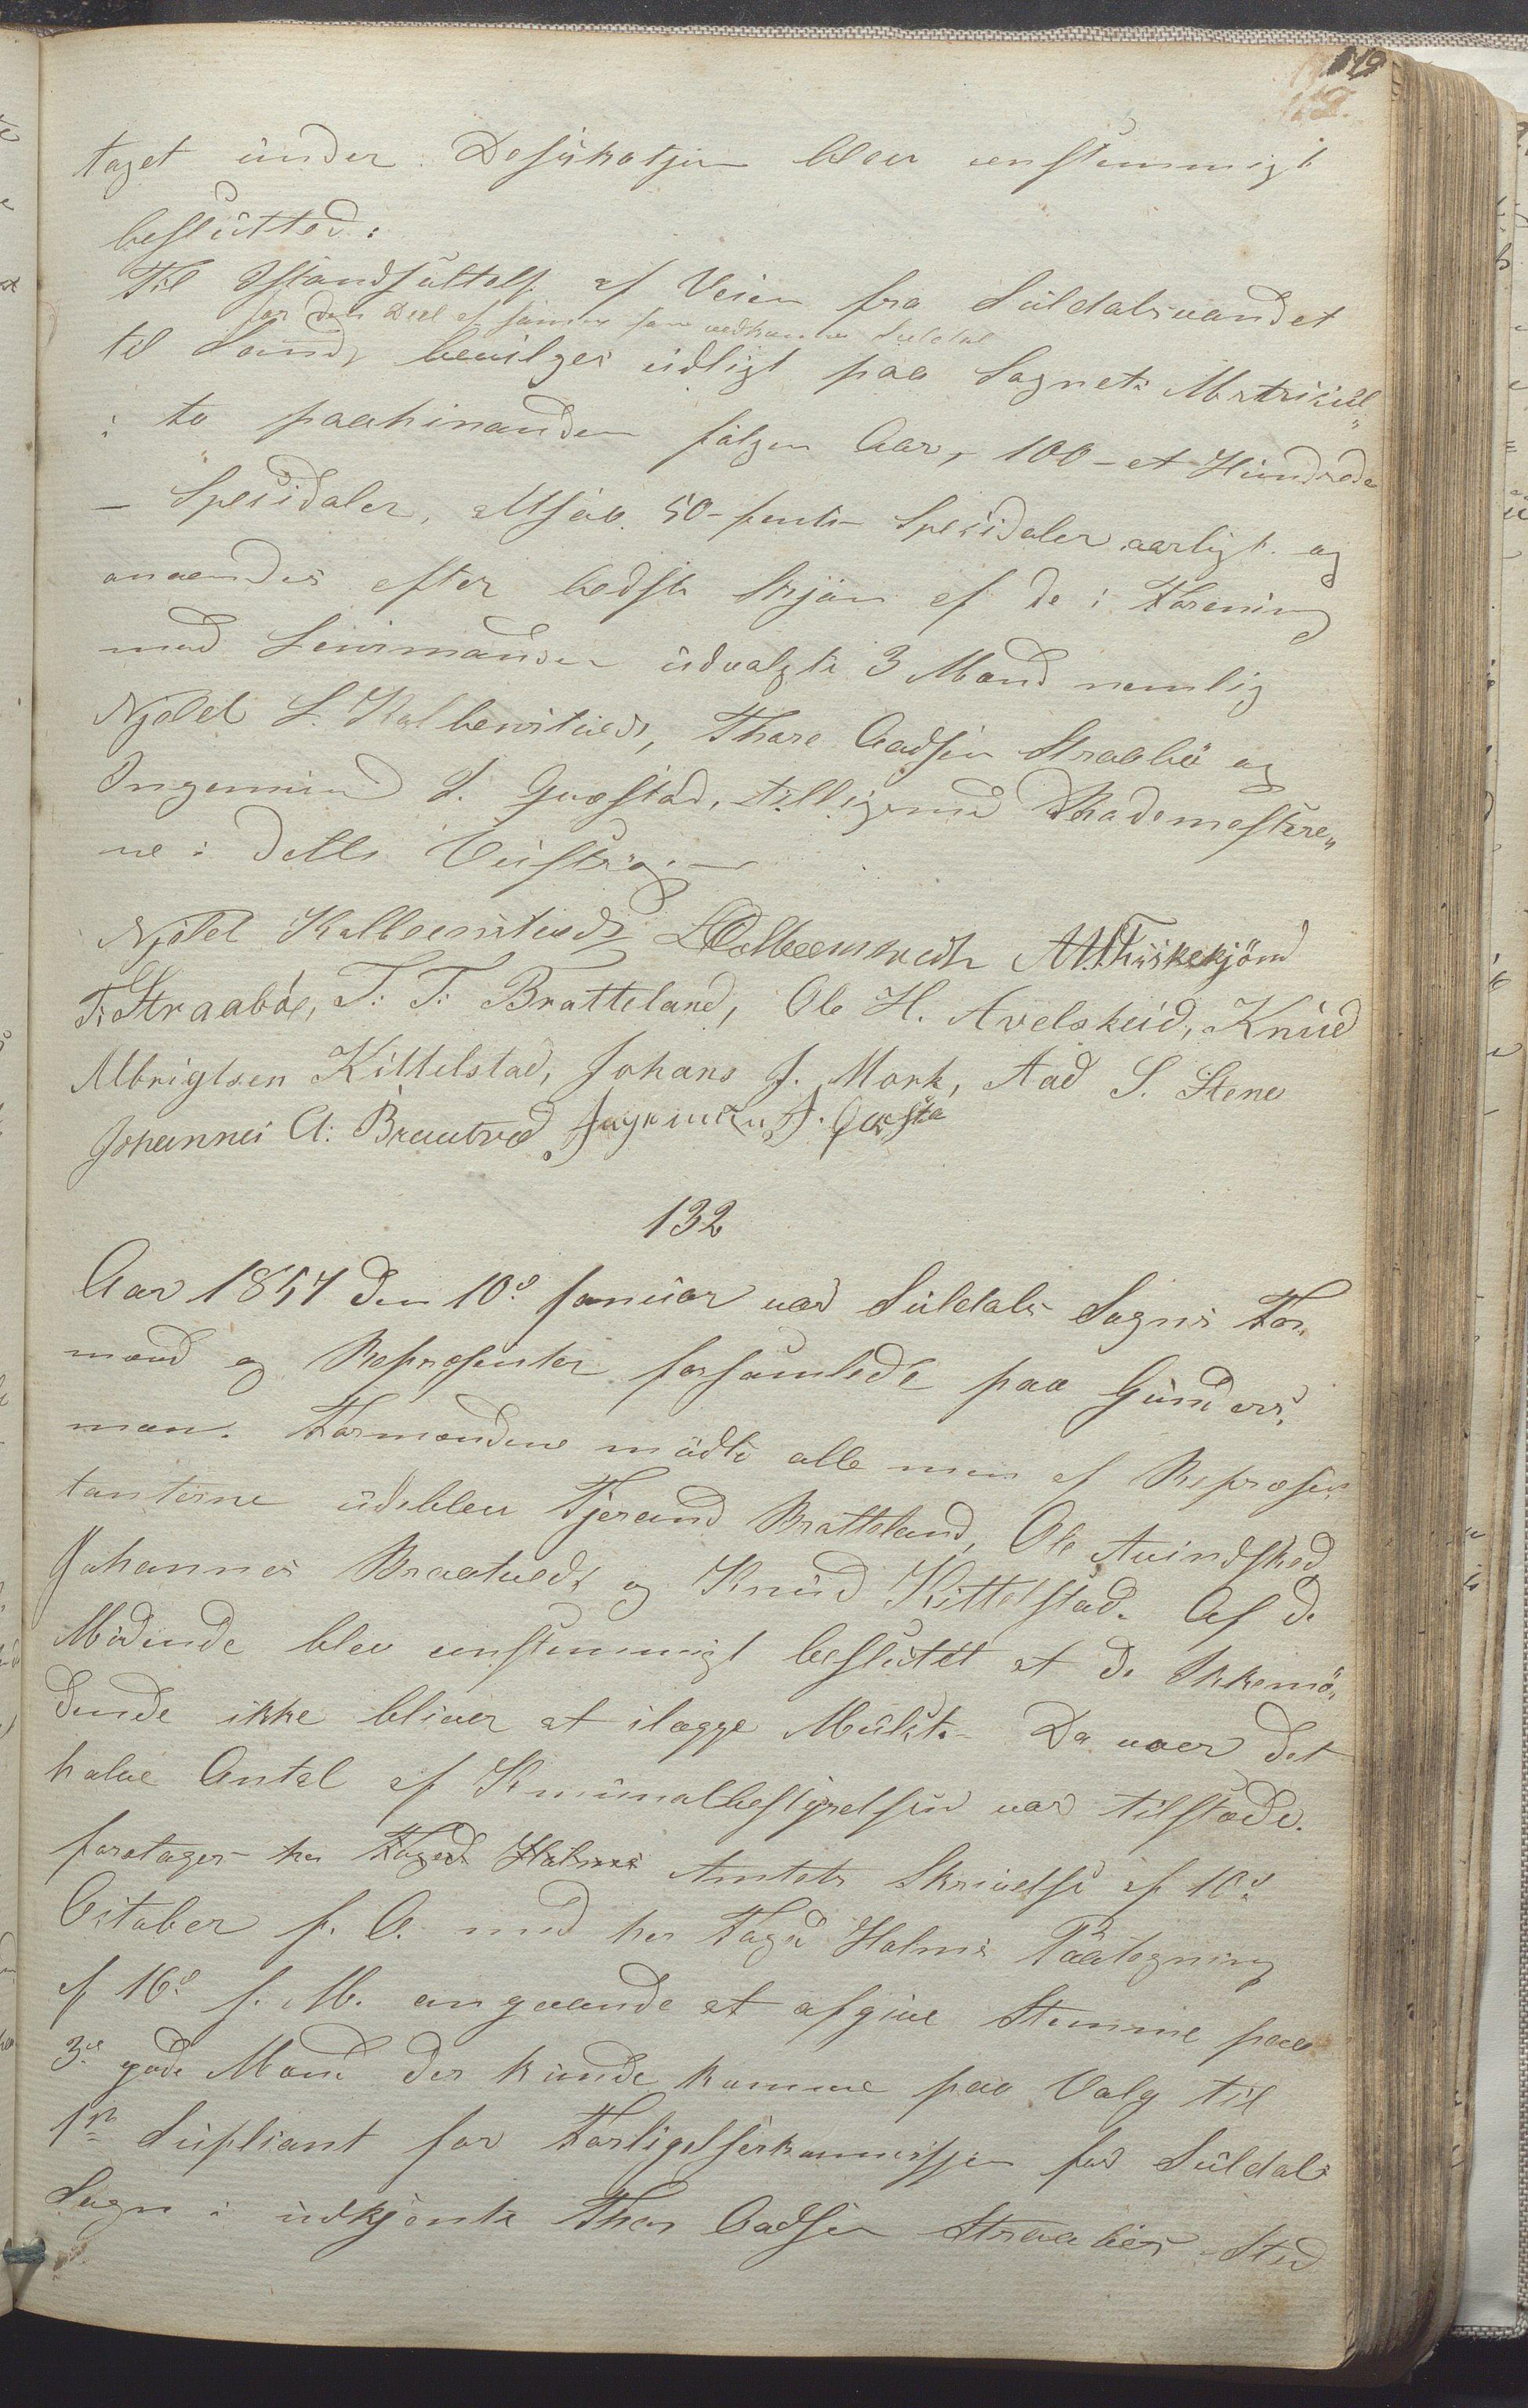 IKAR, Suldal kommune - Formannskapet/Rådmannen, A/Aa/L0001: Møtebok, 1837-1876, s. 119a